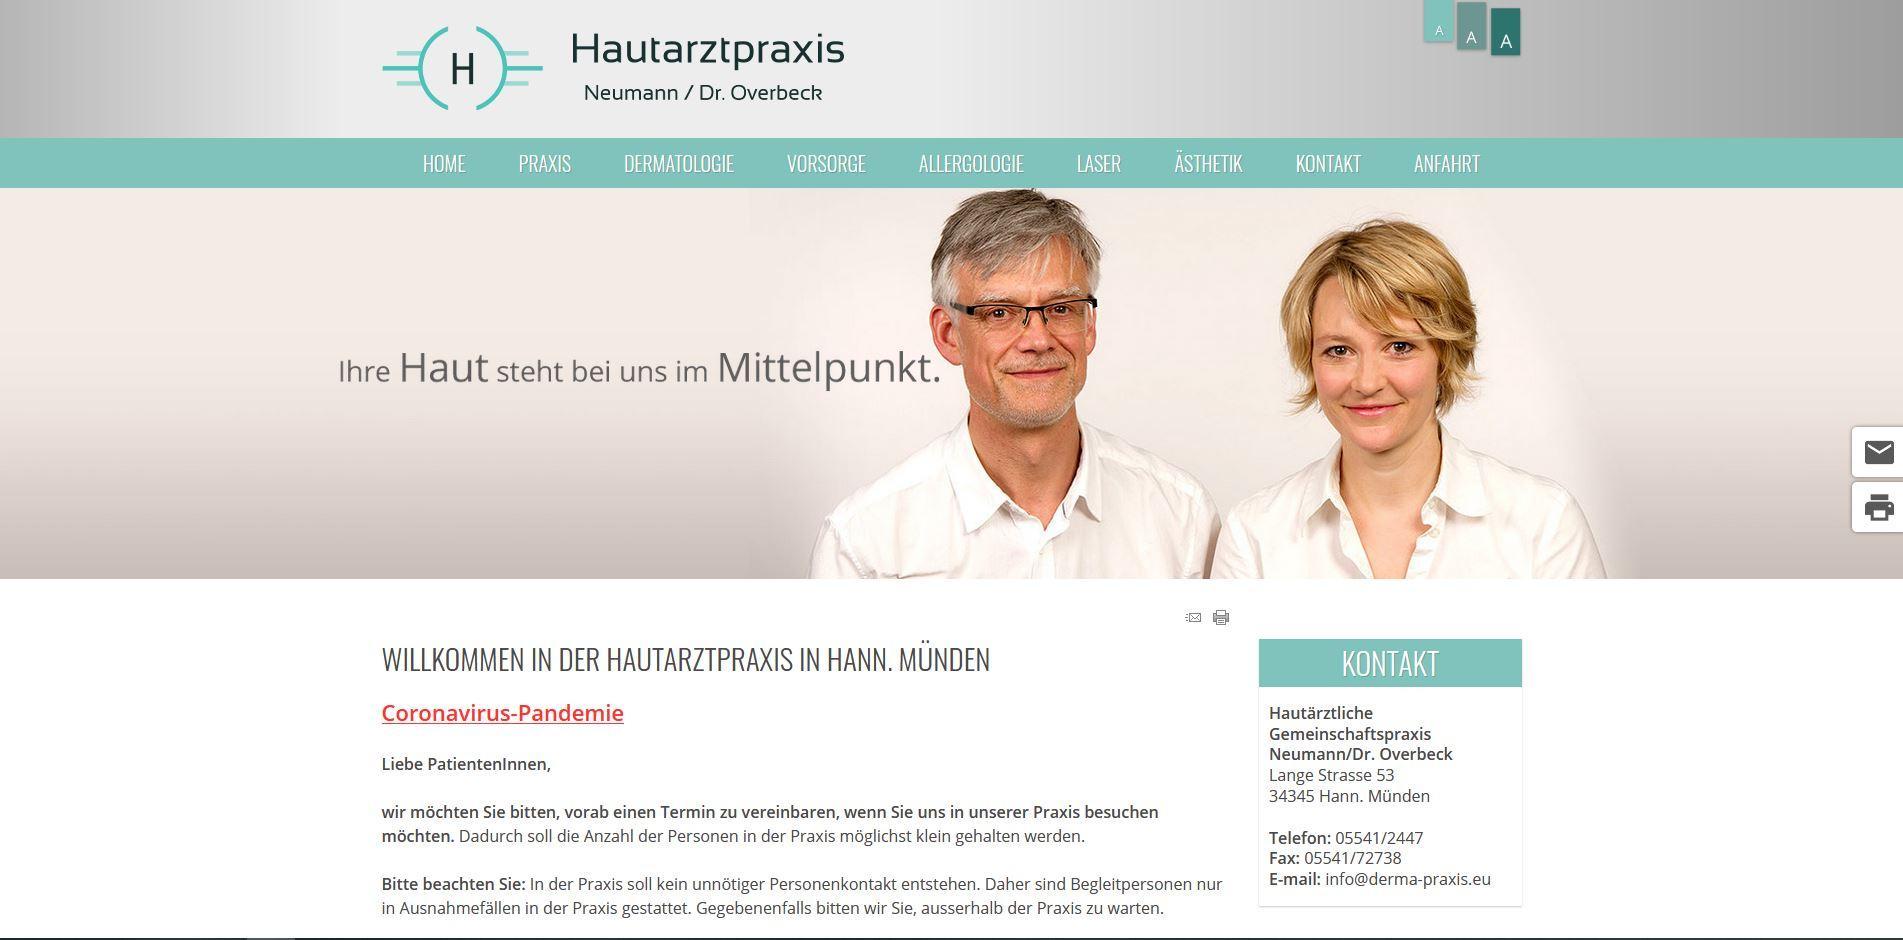 Hautarztpraxis in Hann. Münden